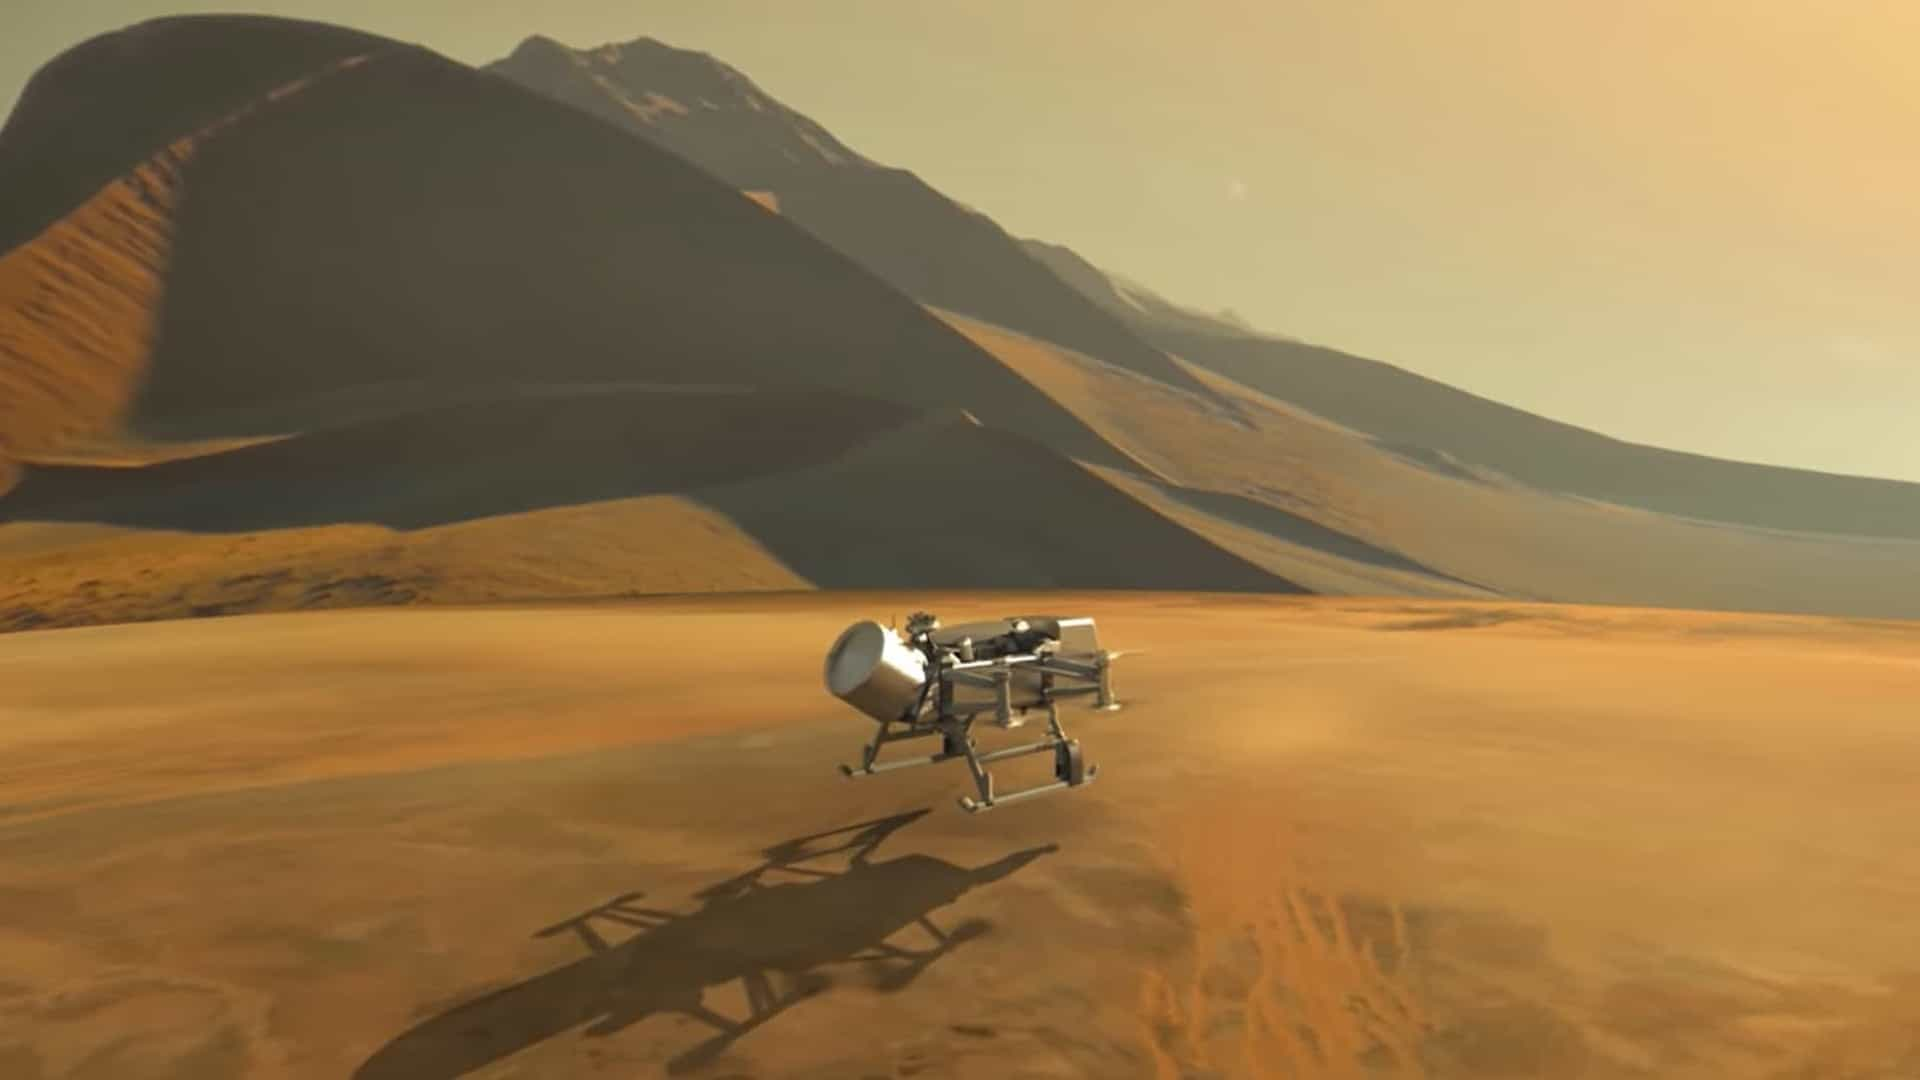 NASA adia envio de drone a lua de Saturno